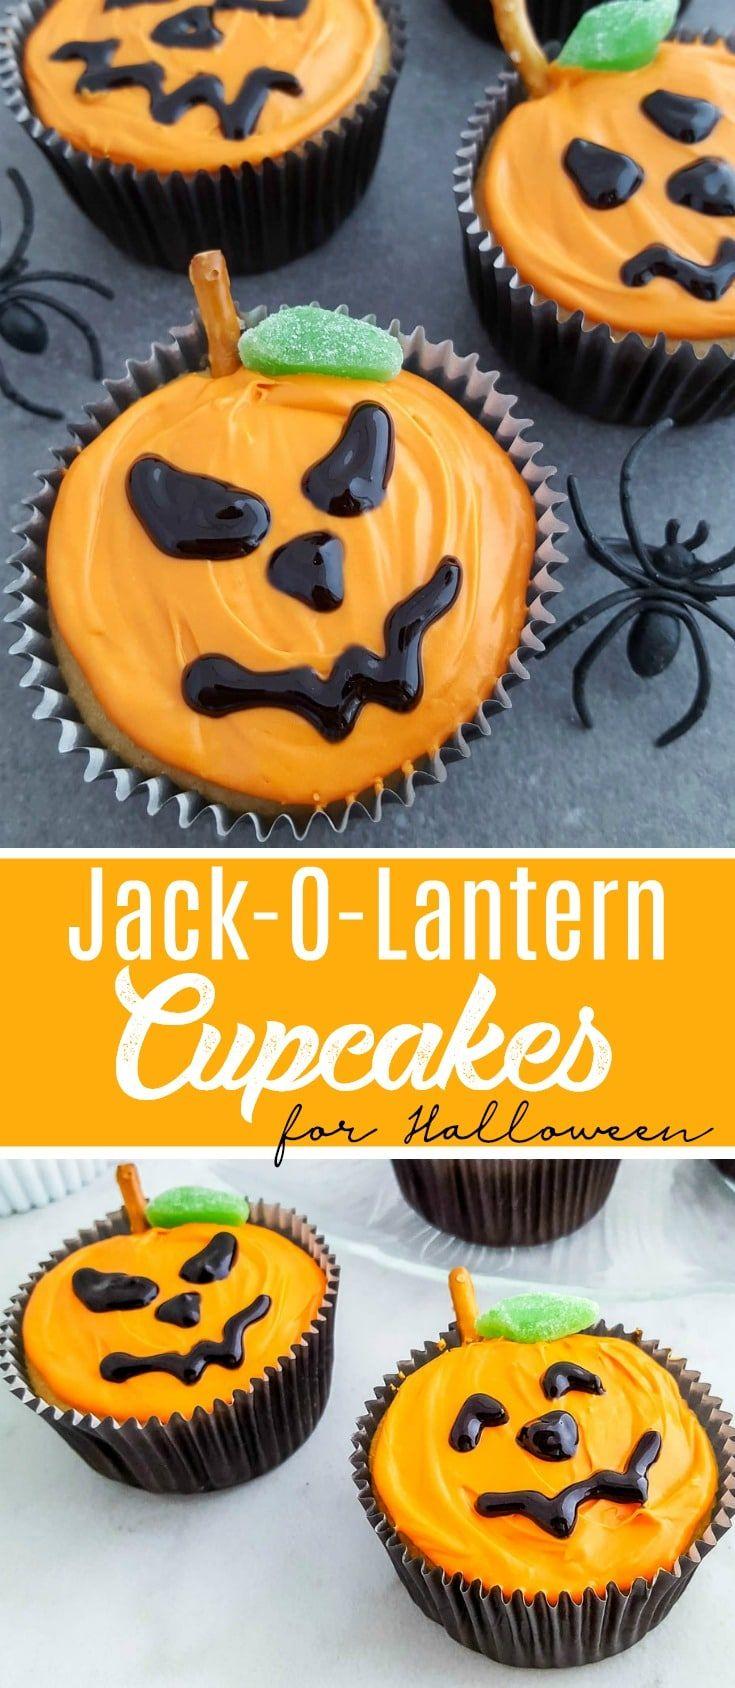 Jack-O-Lantern Cupcakes Recipe for Halloween #jackolantern #halloweenfoods #halloweenpartyideas #HalloweenTreat #halloweencupcakes